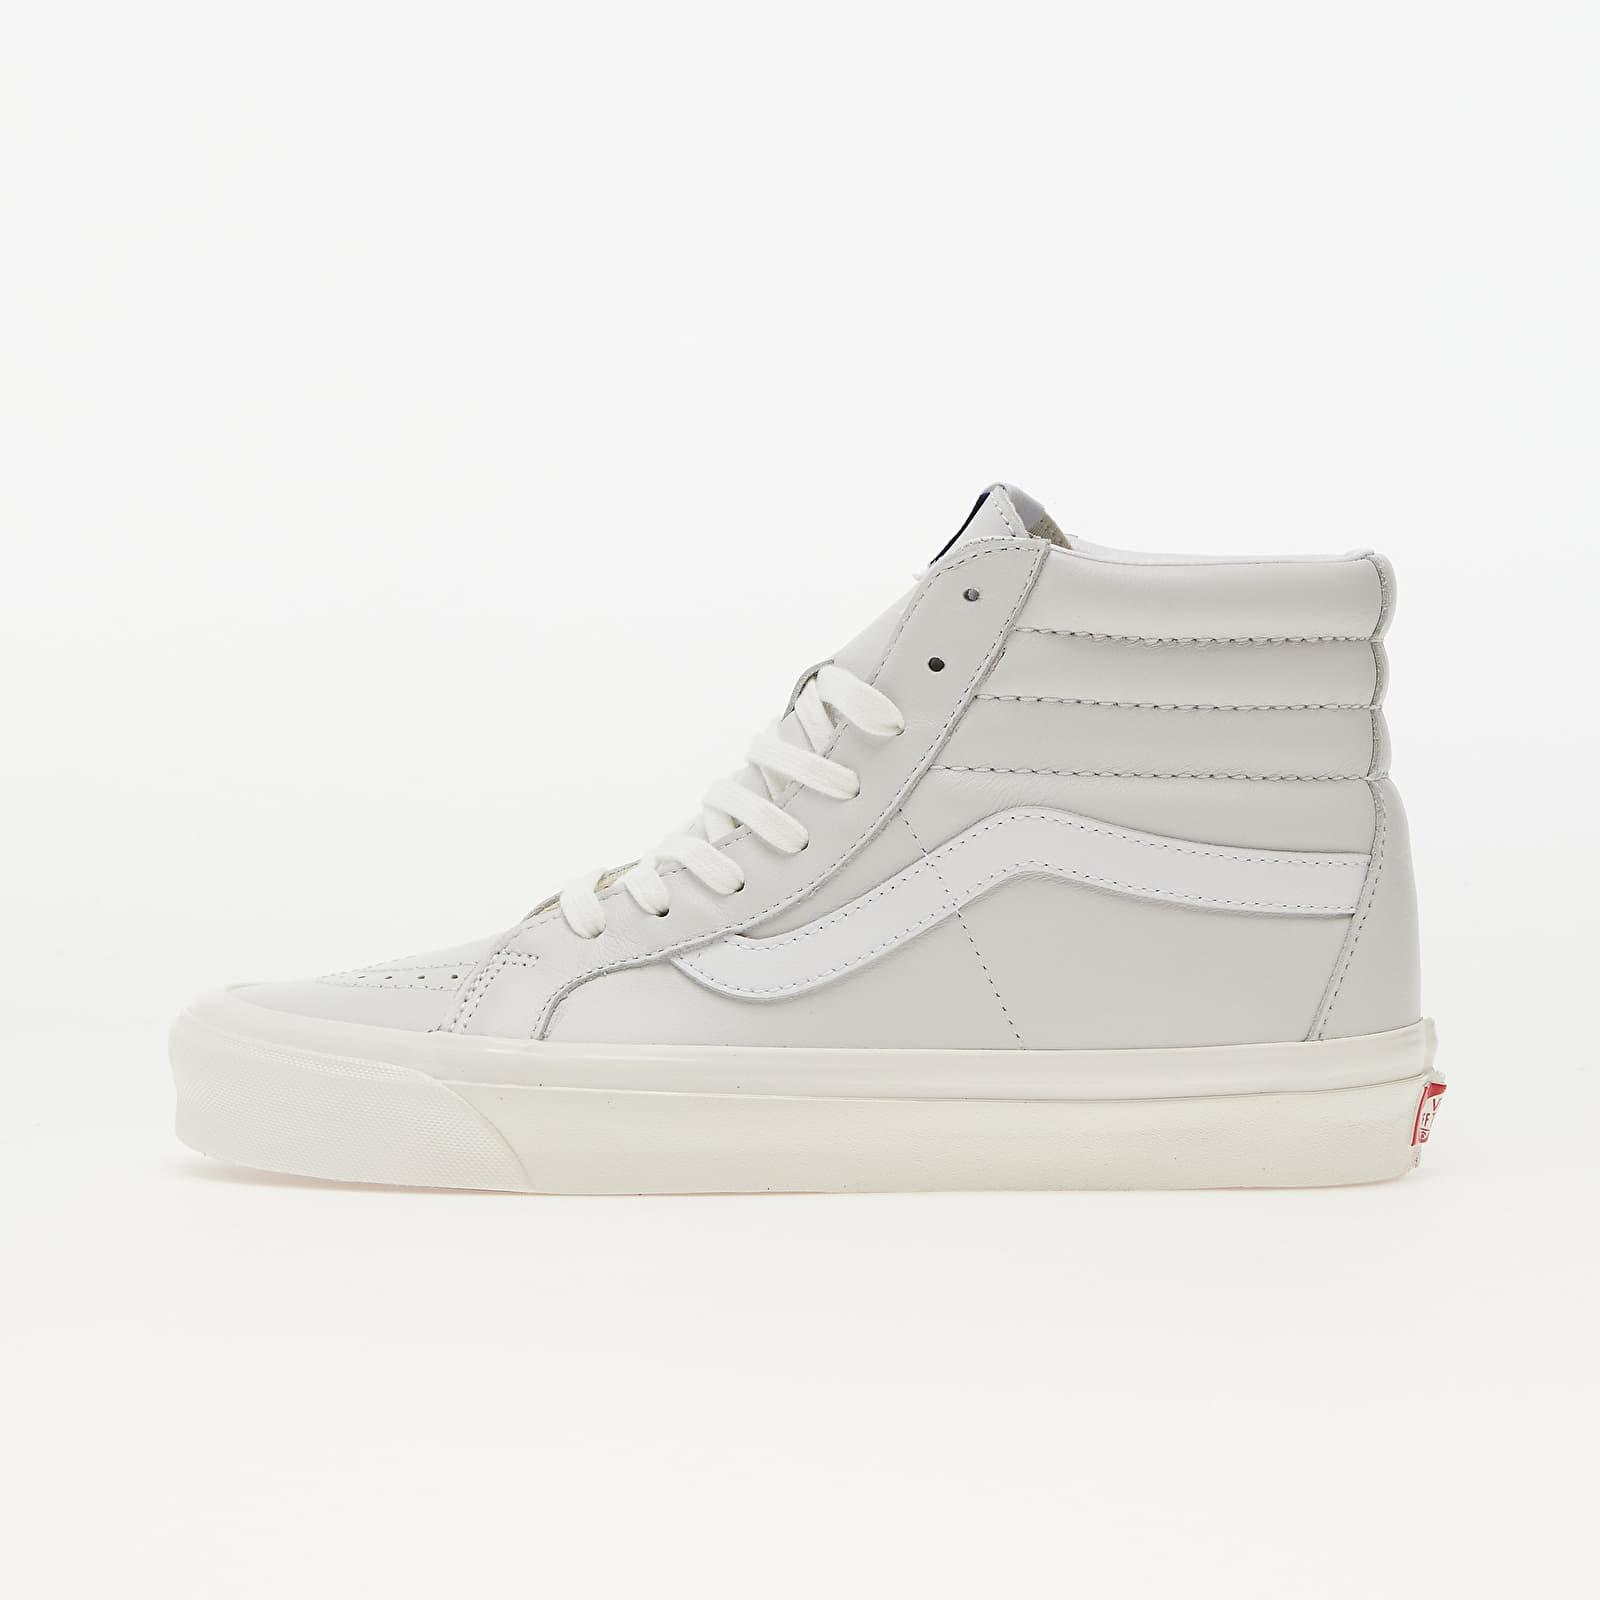 Vans Sk8-Hi 38 DX (Anaheim Factory) True White Leather EUR 43